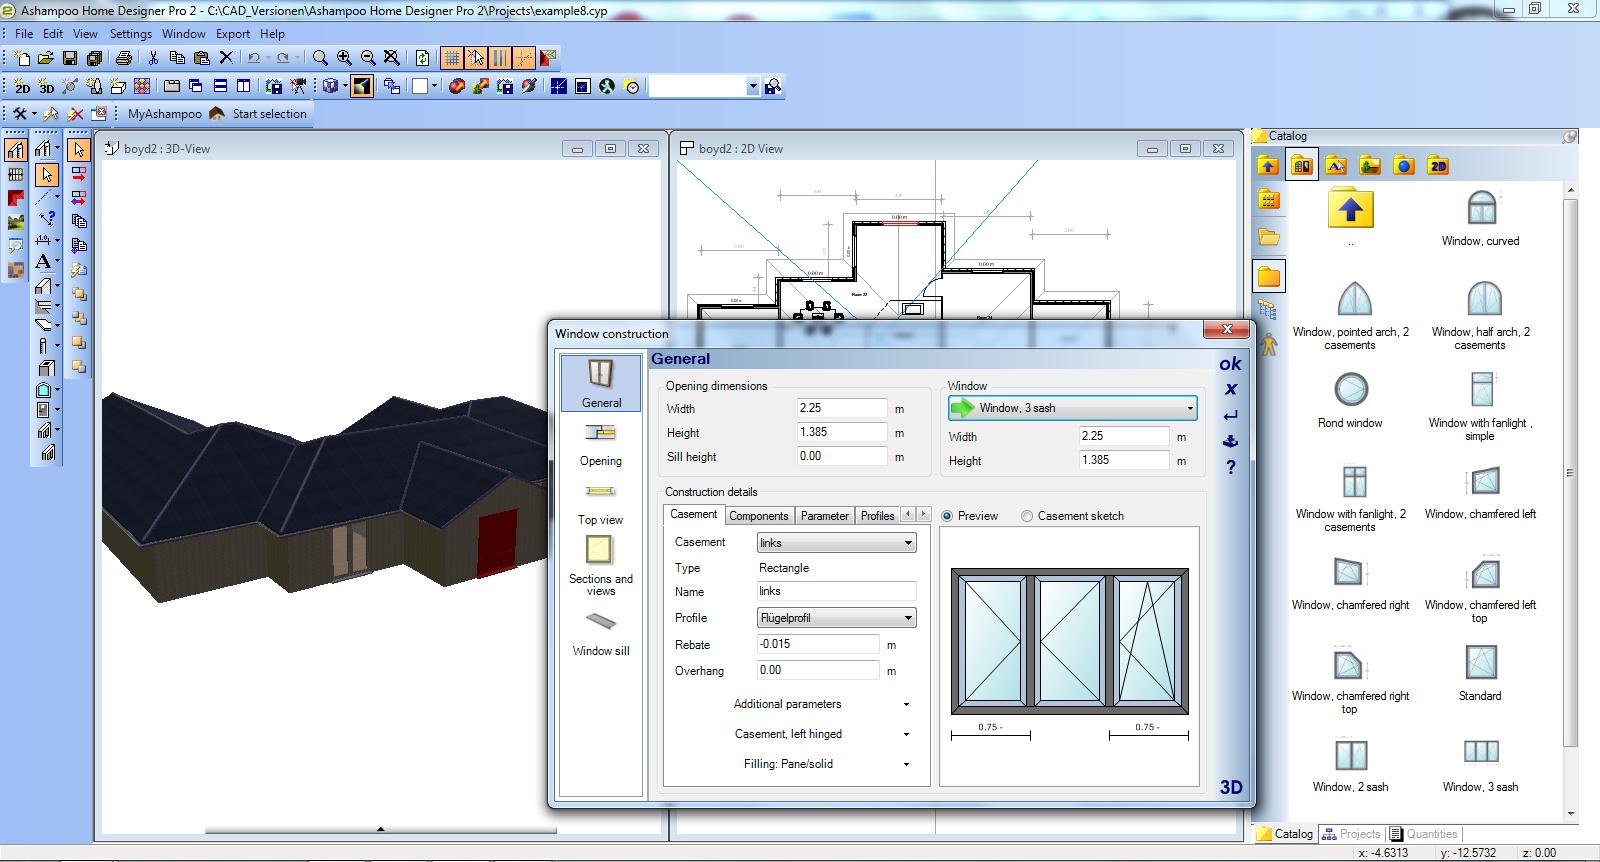 Https Www Ashampoo Com En Usd Pdf 0267 Cad Software Ashampoo Home Designer Pro 2